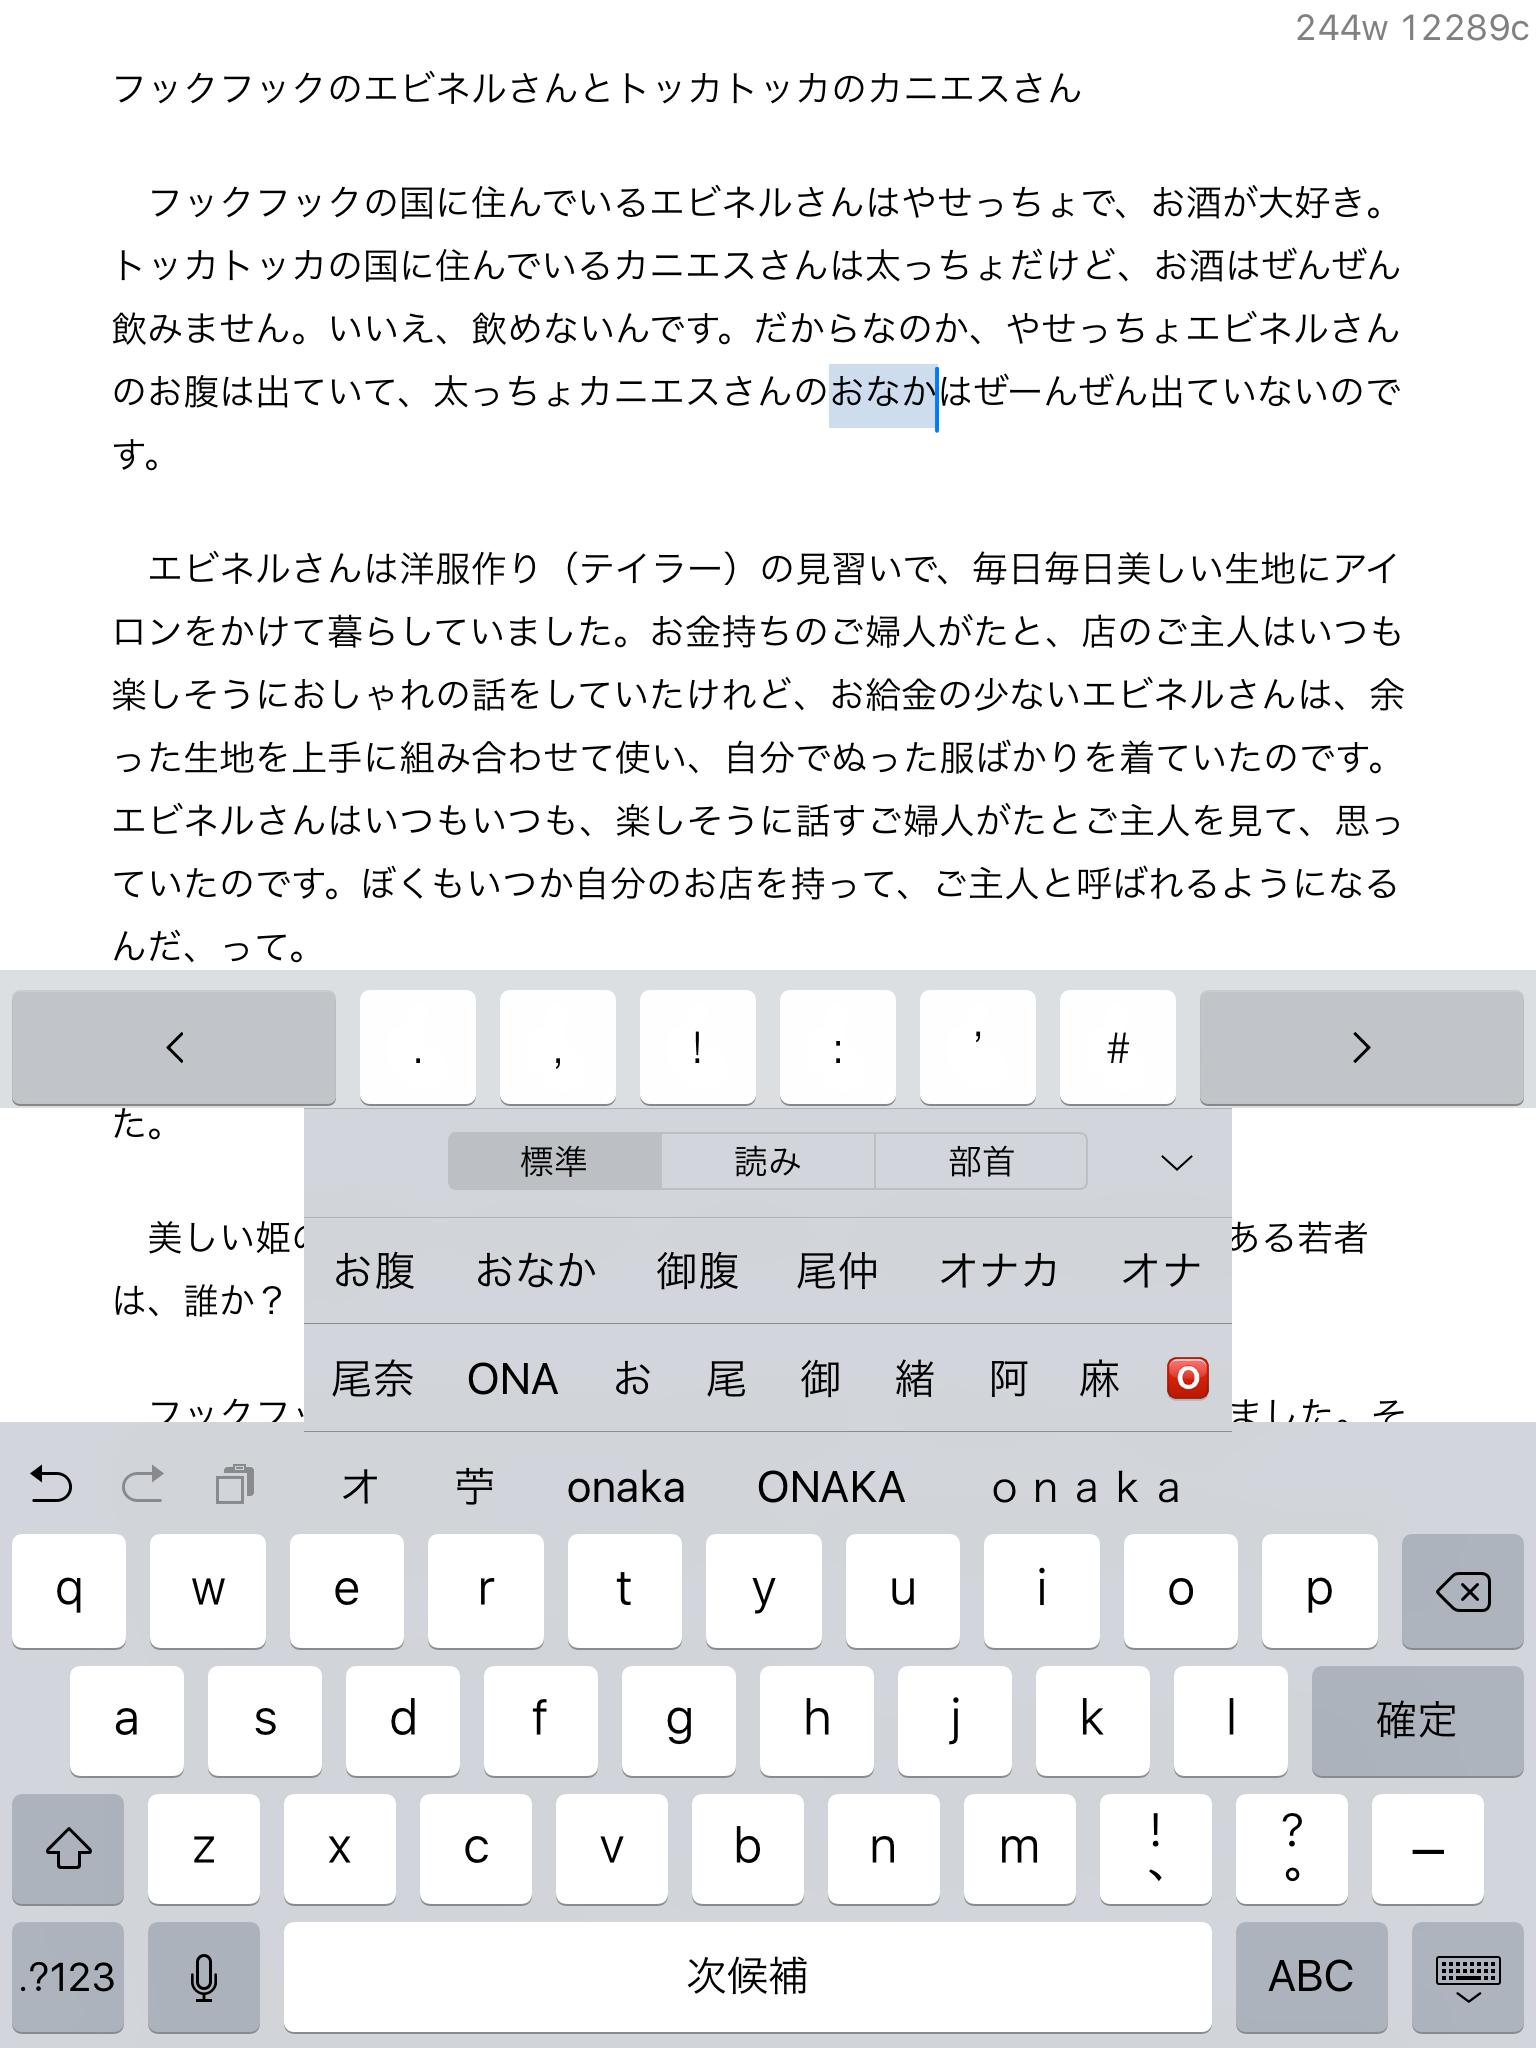 iPad mini:入力中の文章はちゃんと見えてる